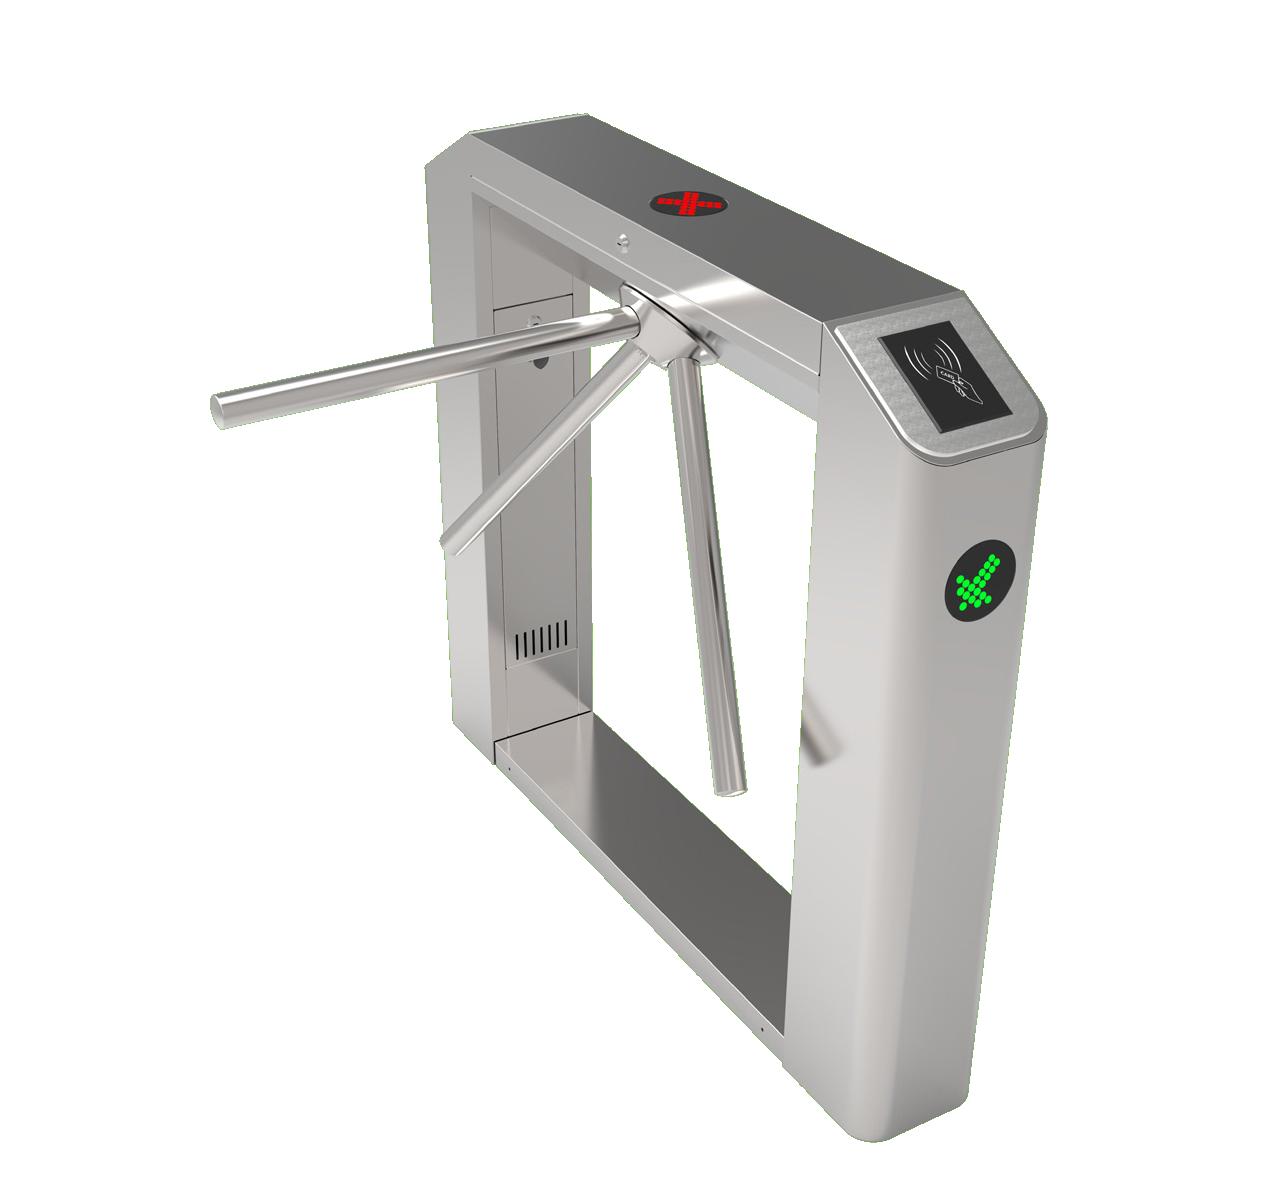 ts2100, zkteco, tripod turnstile